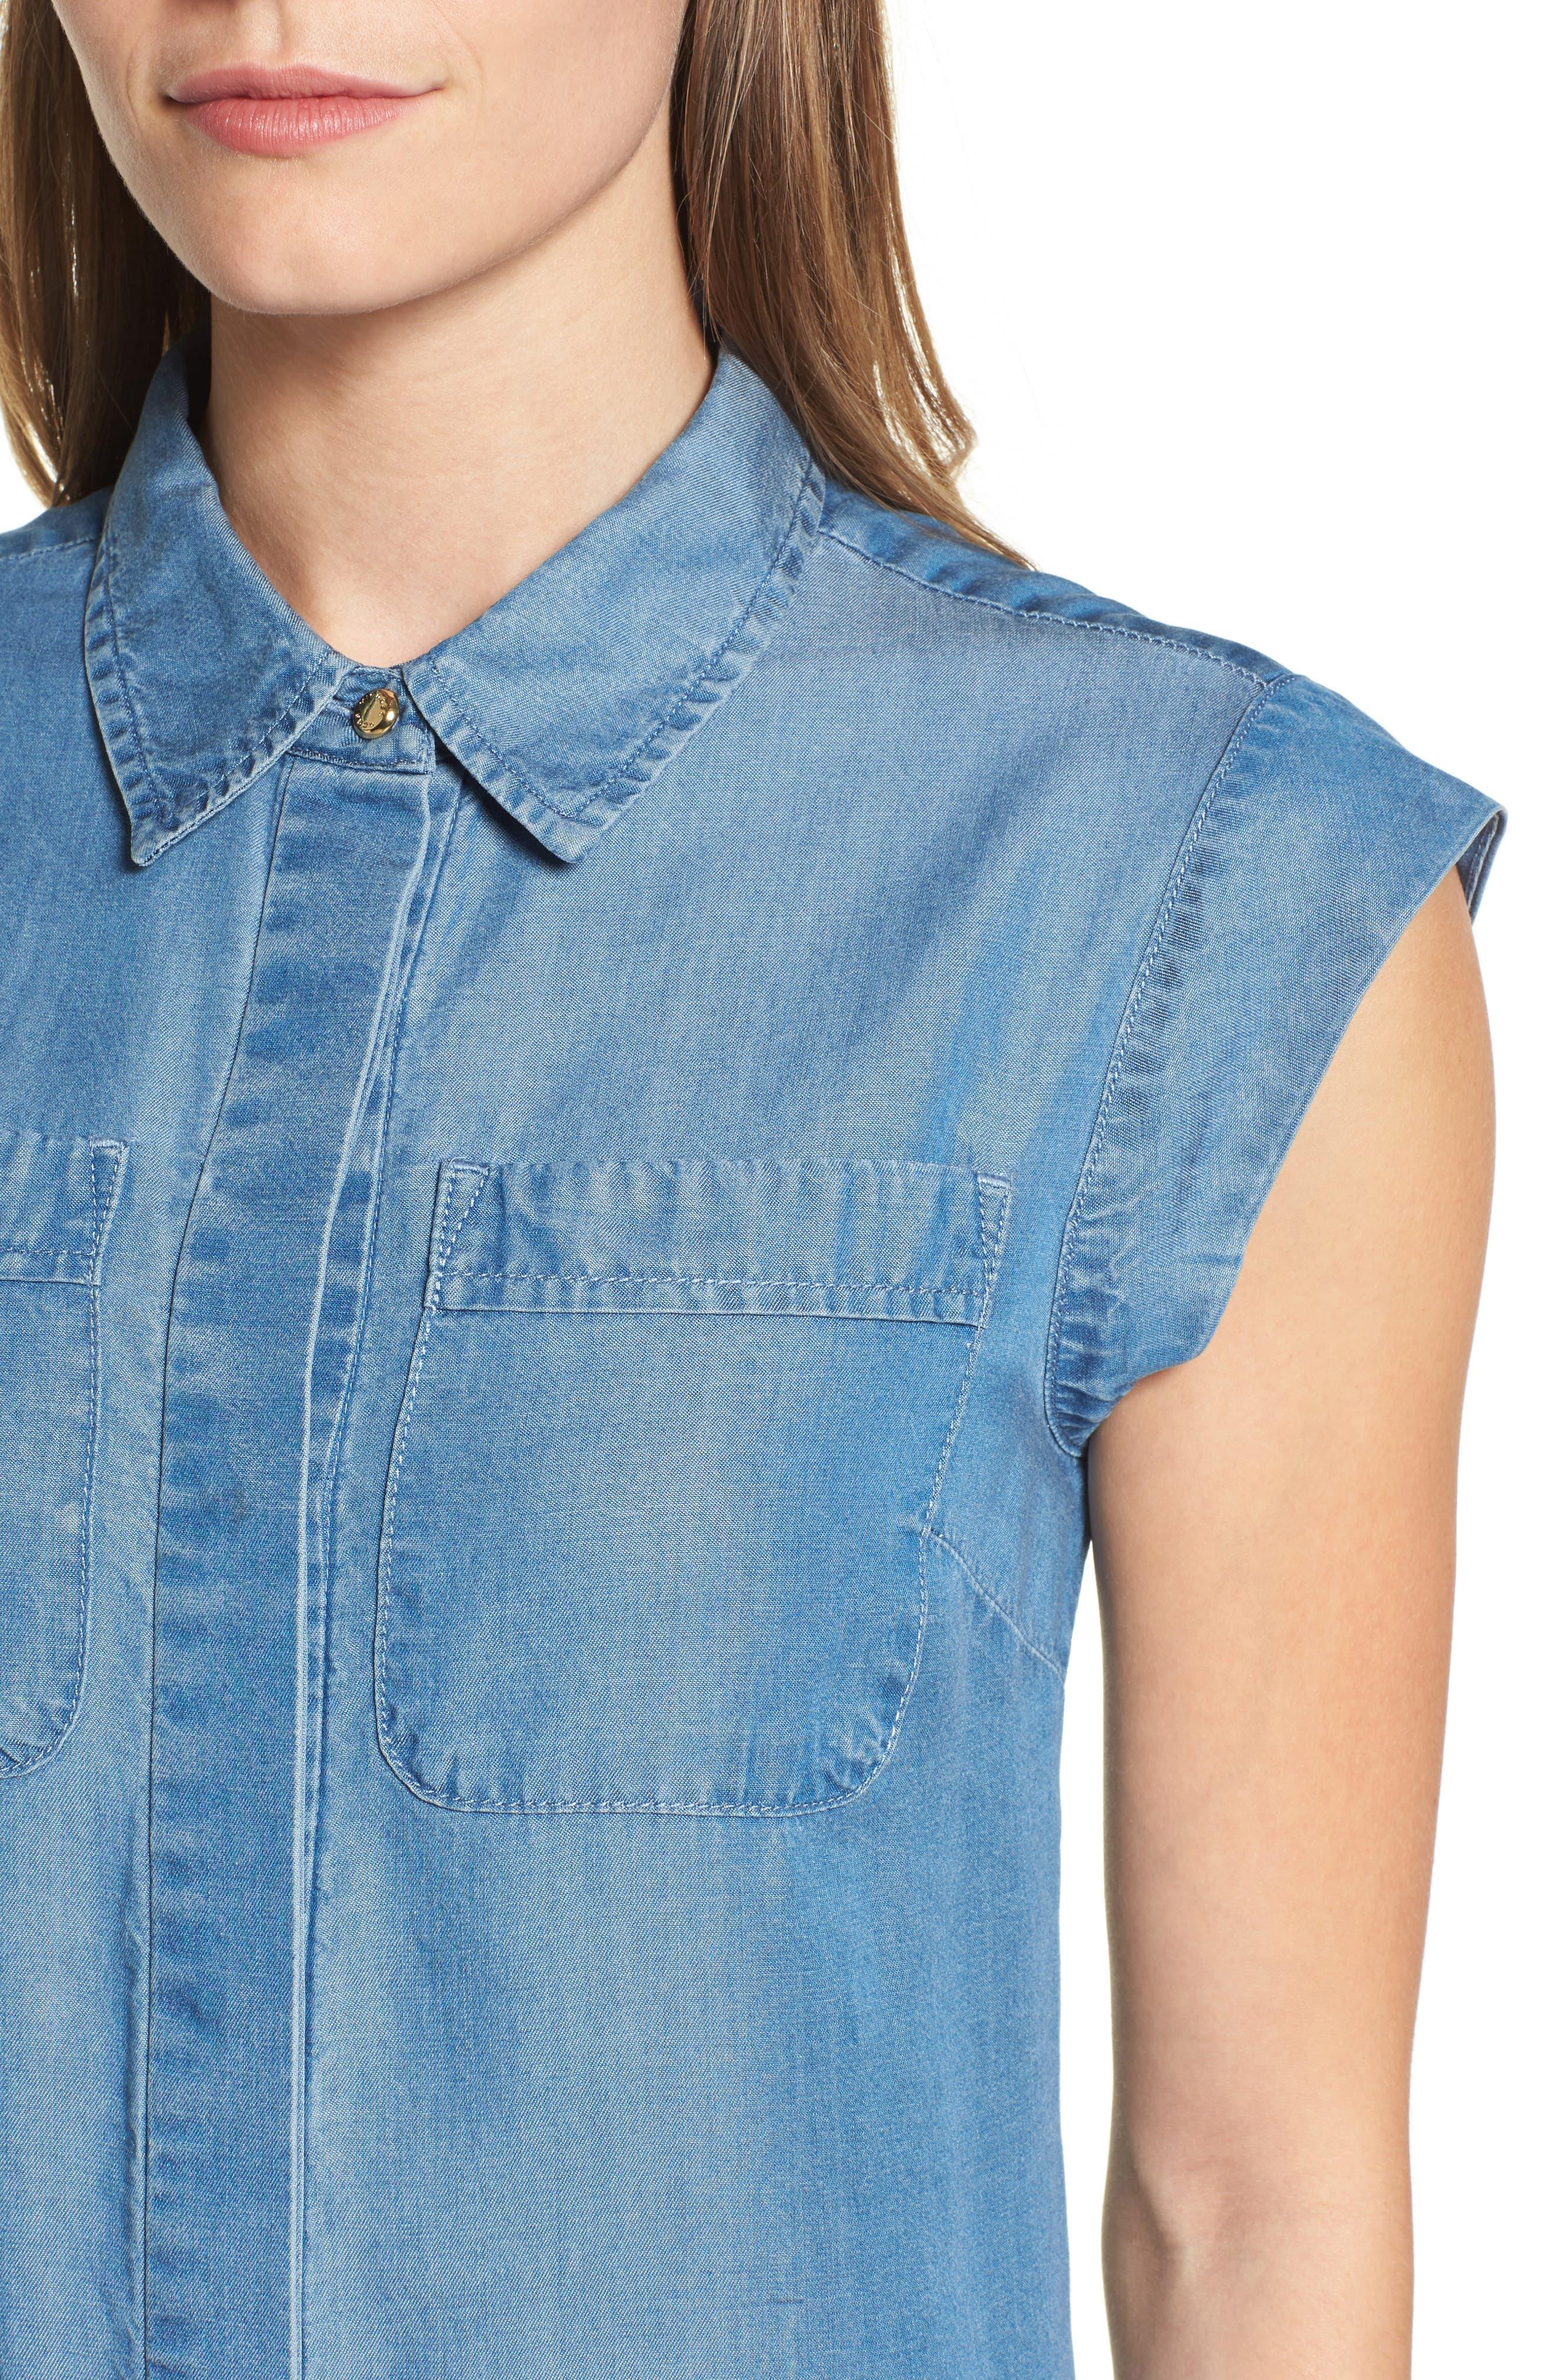 MICHAEL MICHAEL KORS, Patch Pocket Chambray Shirtdress, Alternate thumbnail 4, color, 401